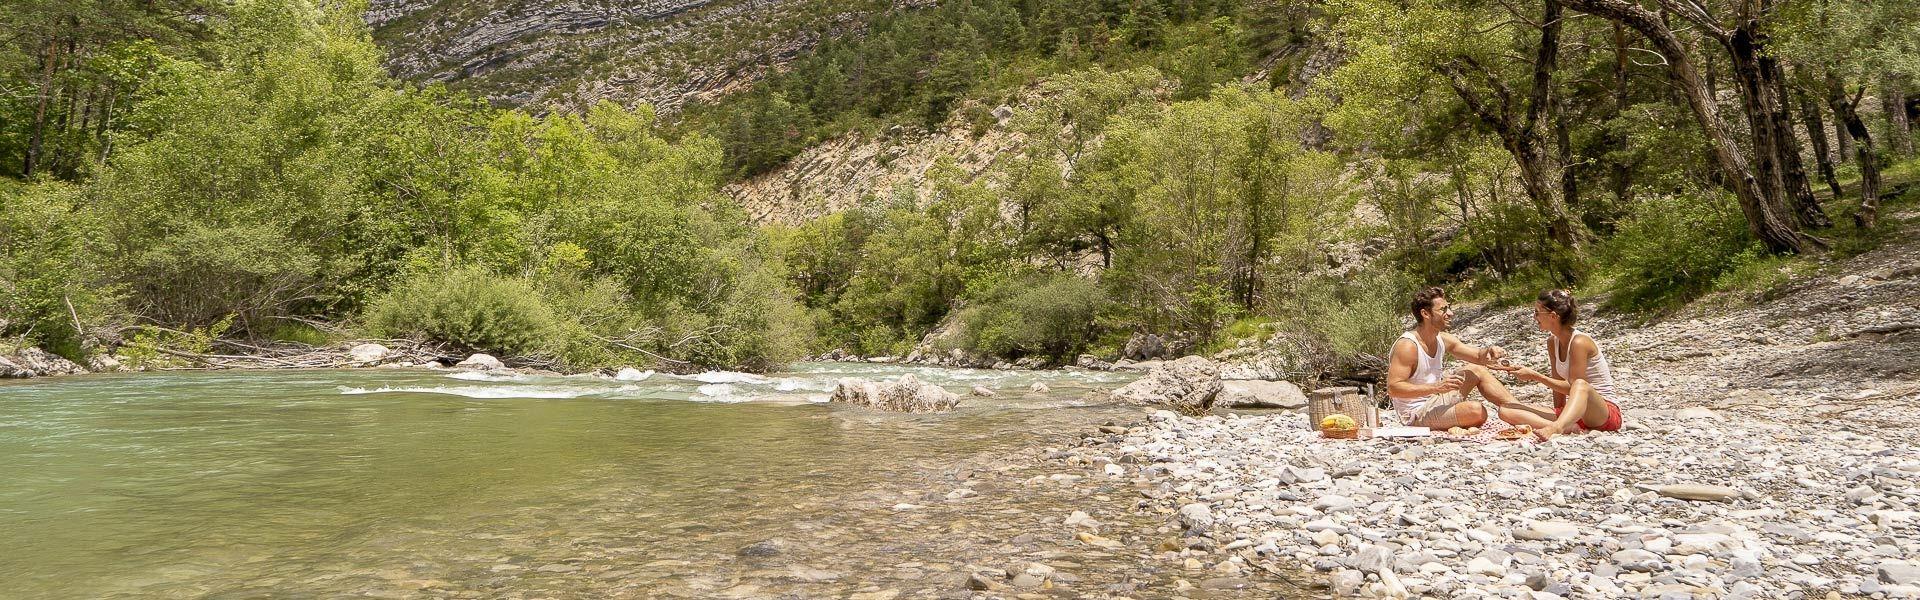 Camping am Flussufer